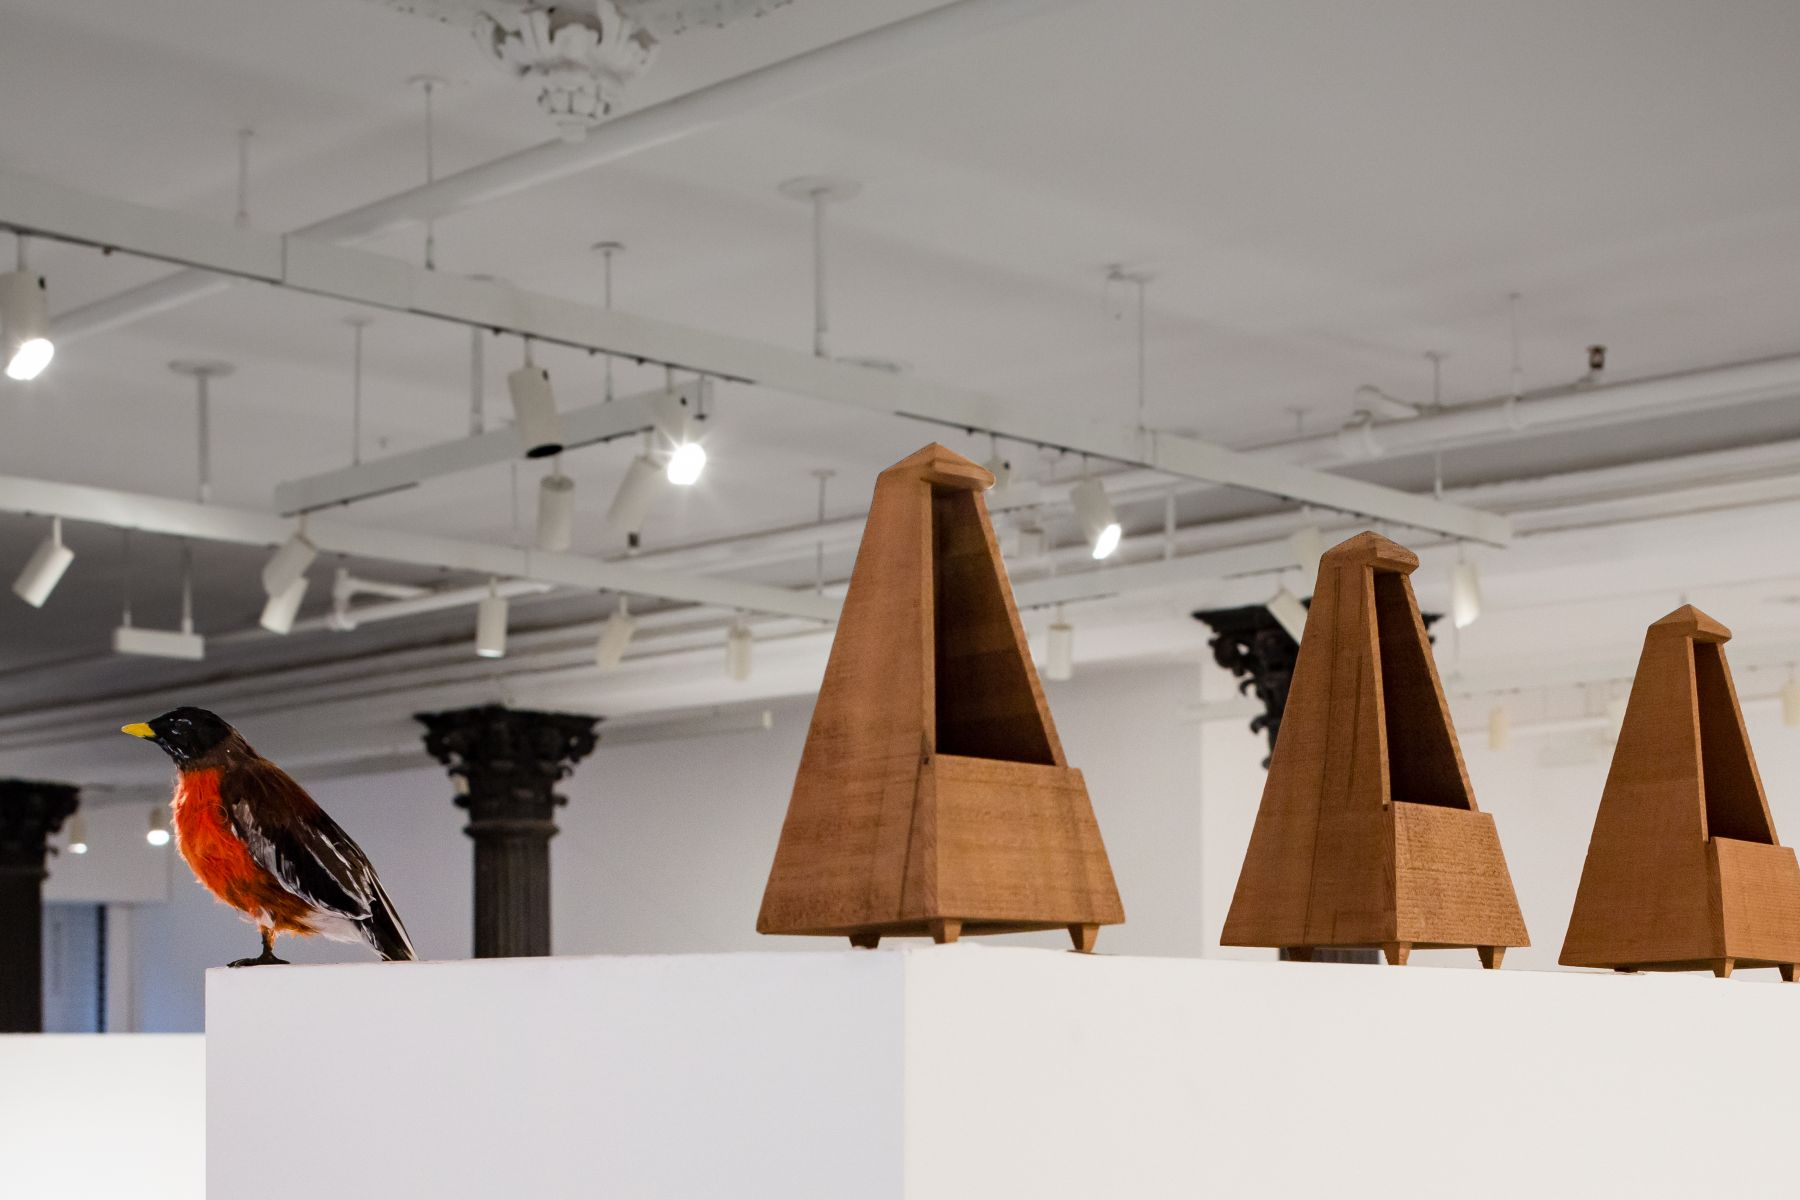 David Adamo, Peter Freeman, Inc., New York